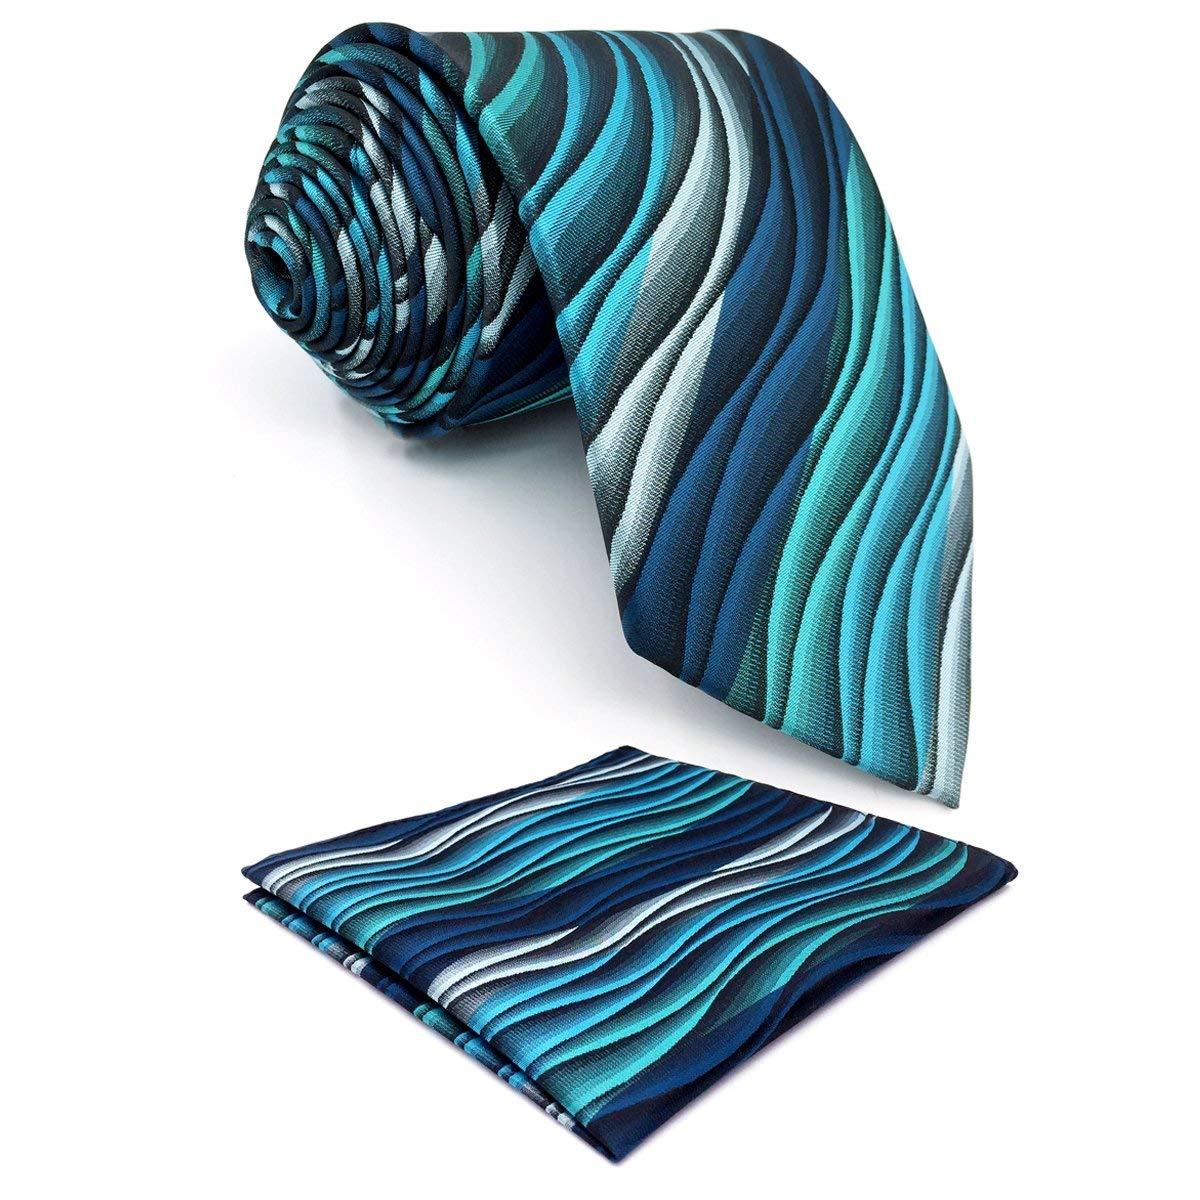 Shlax/&Wing Mens Neckties Extra Long Ripple Blue Multicolored Ties Silk 63